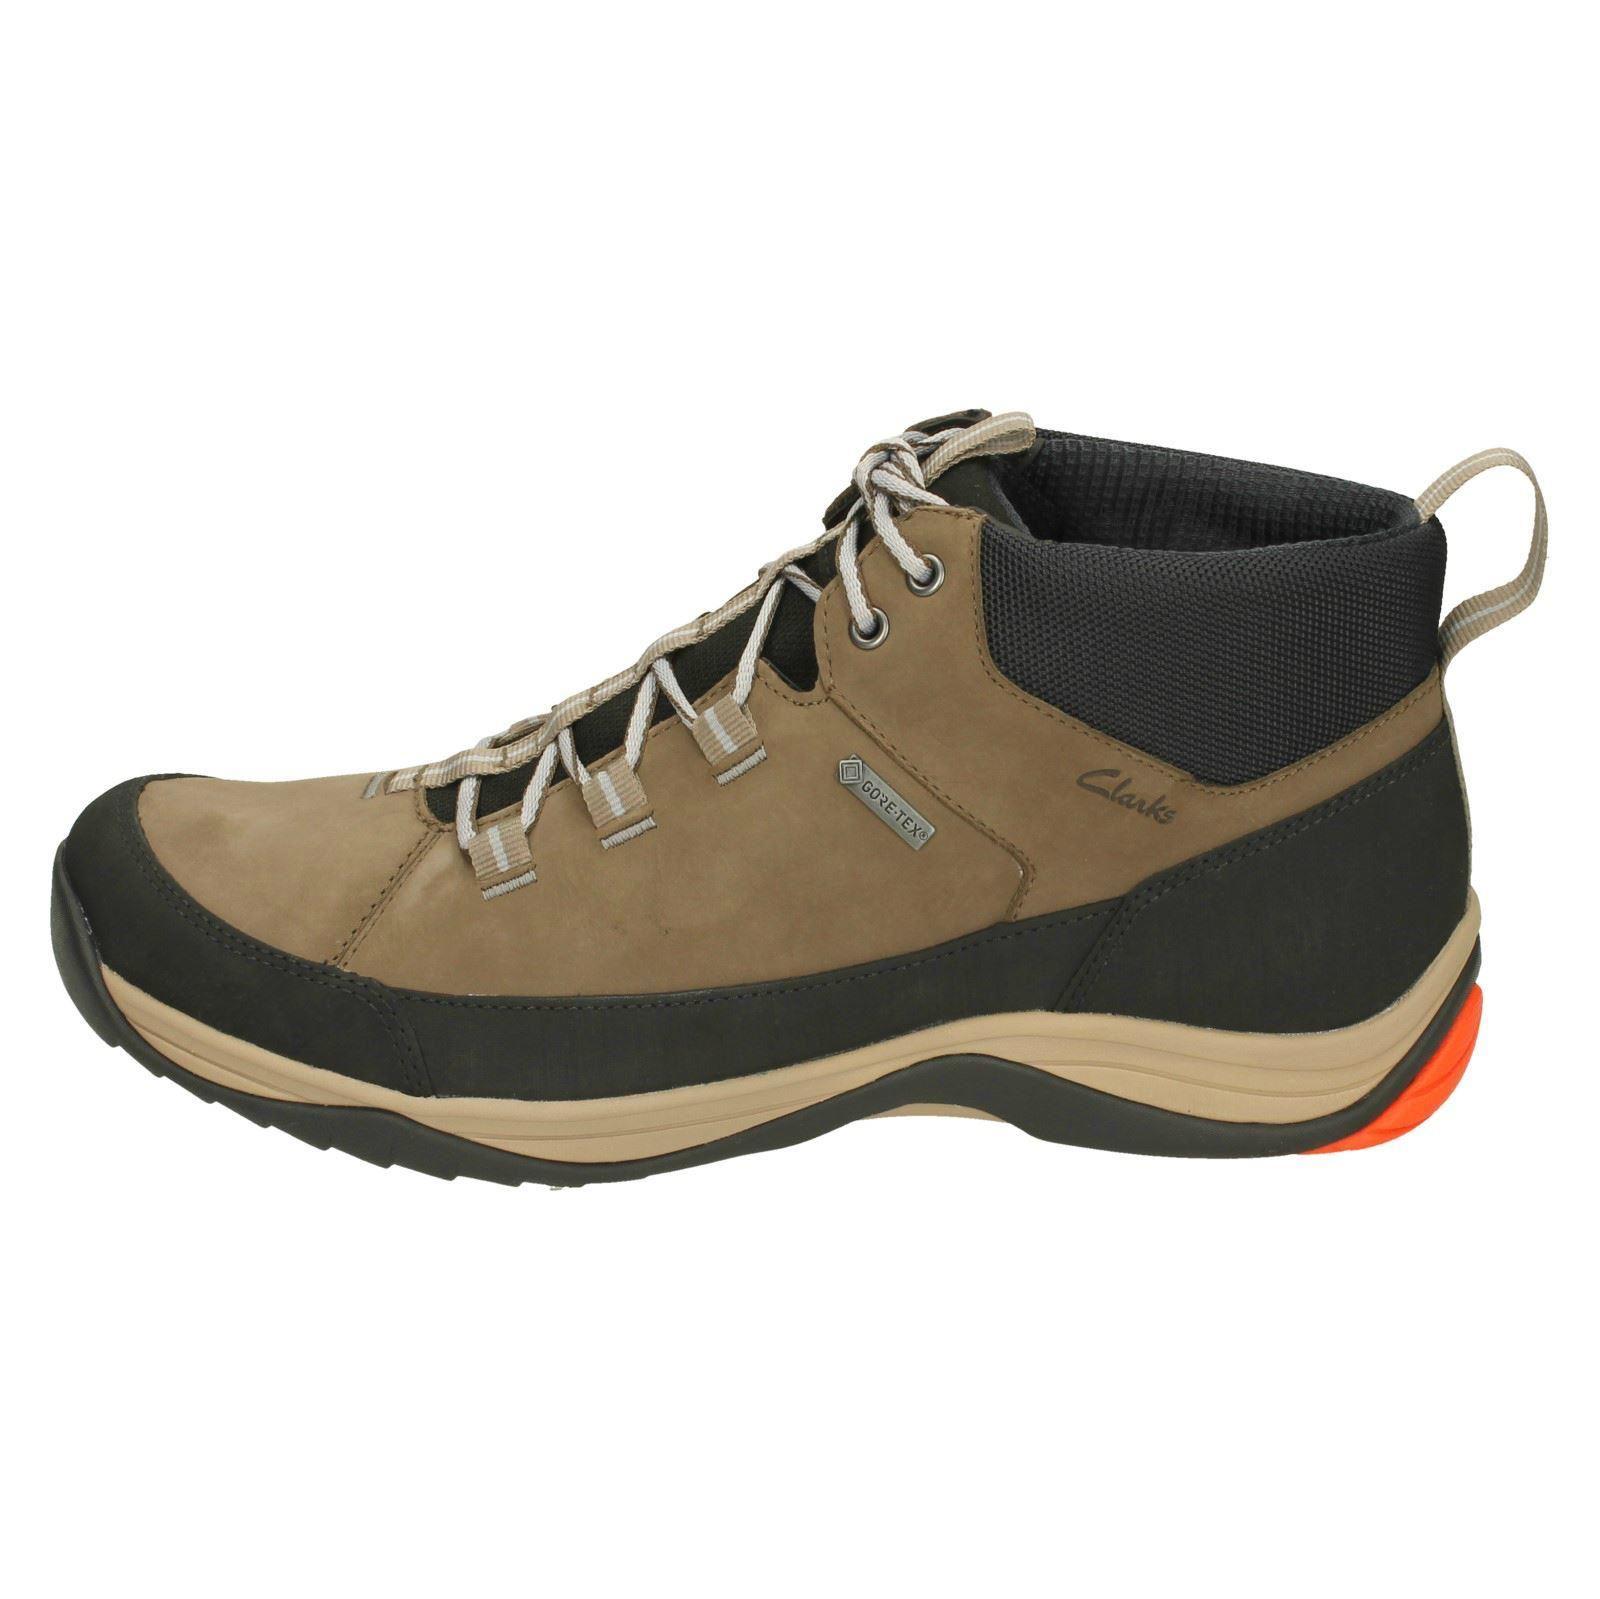 clarks mens walking boots sale